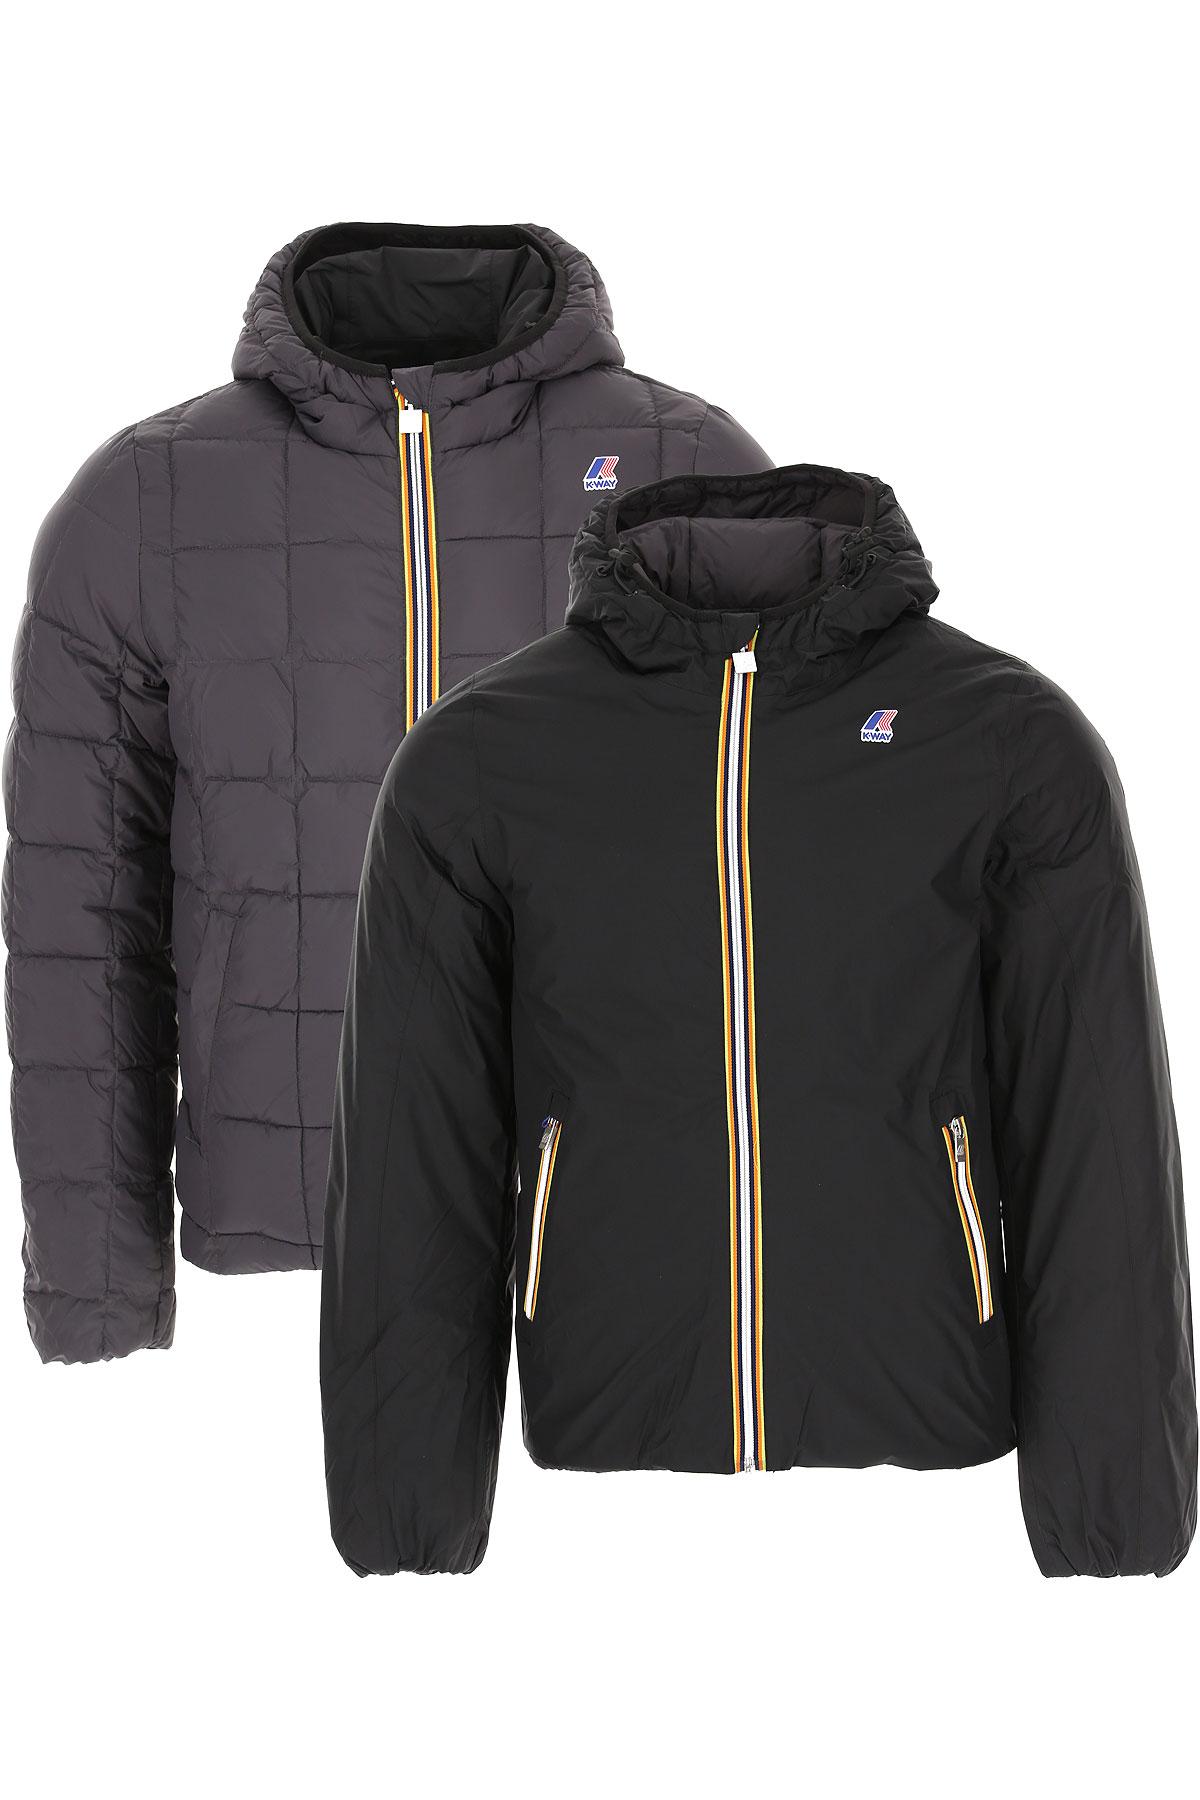 K-Way Down Jacket for Men, Puffer Ski Jacket On Sale, Black, polyamide, 2019, M XL XXL